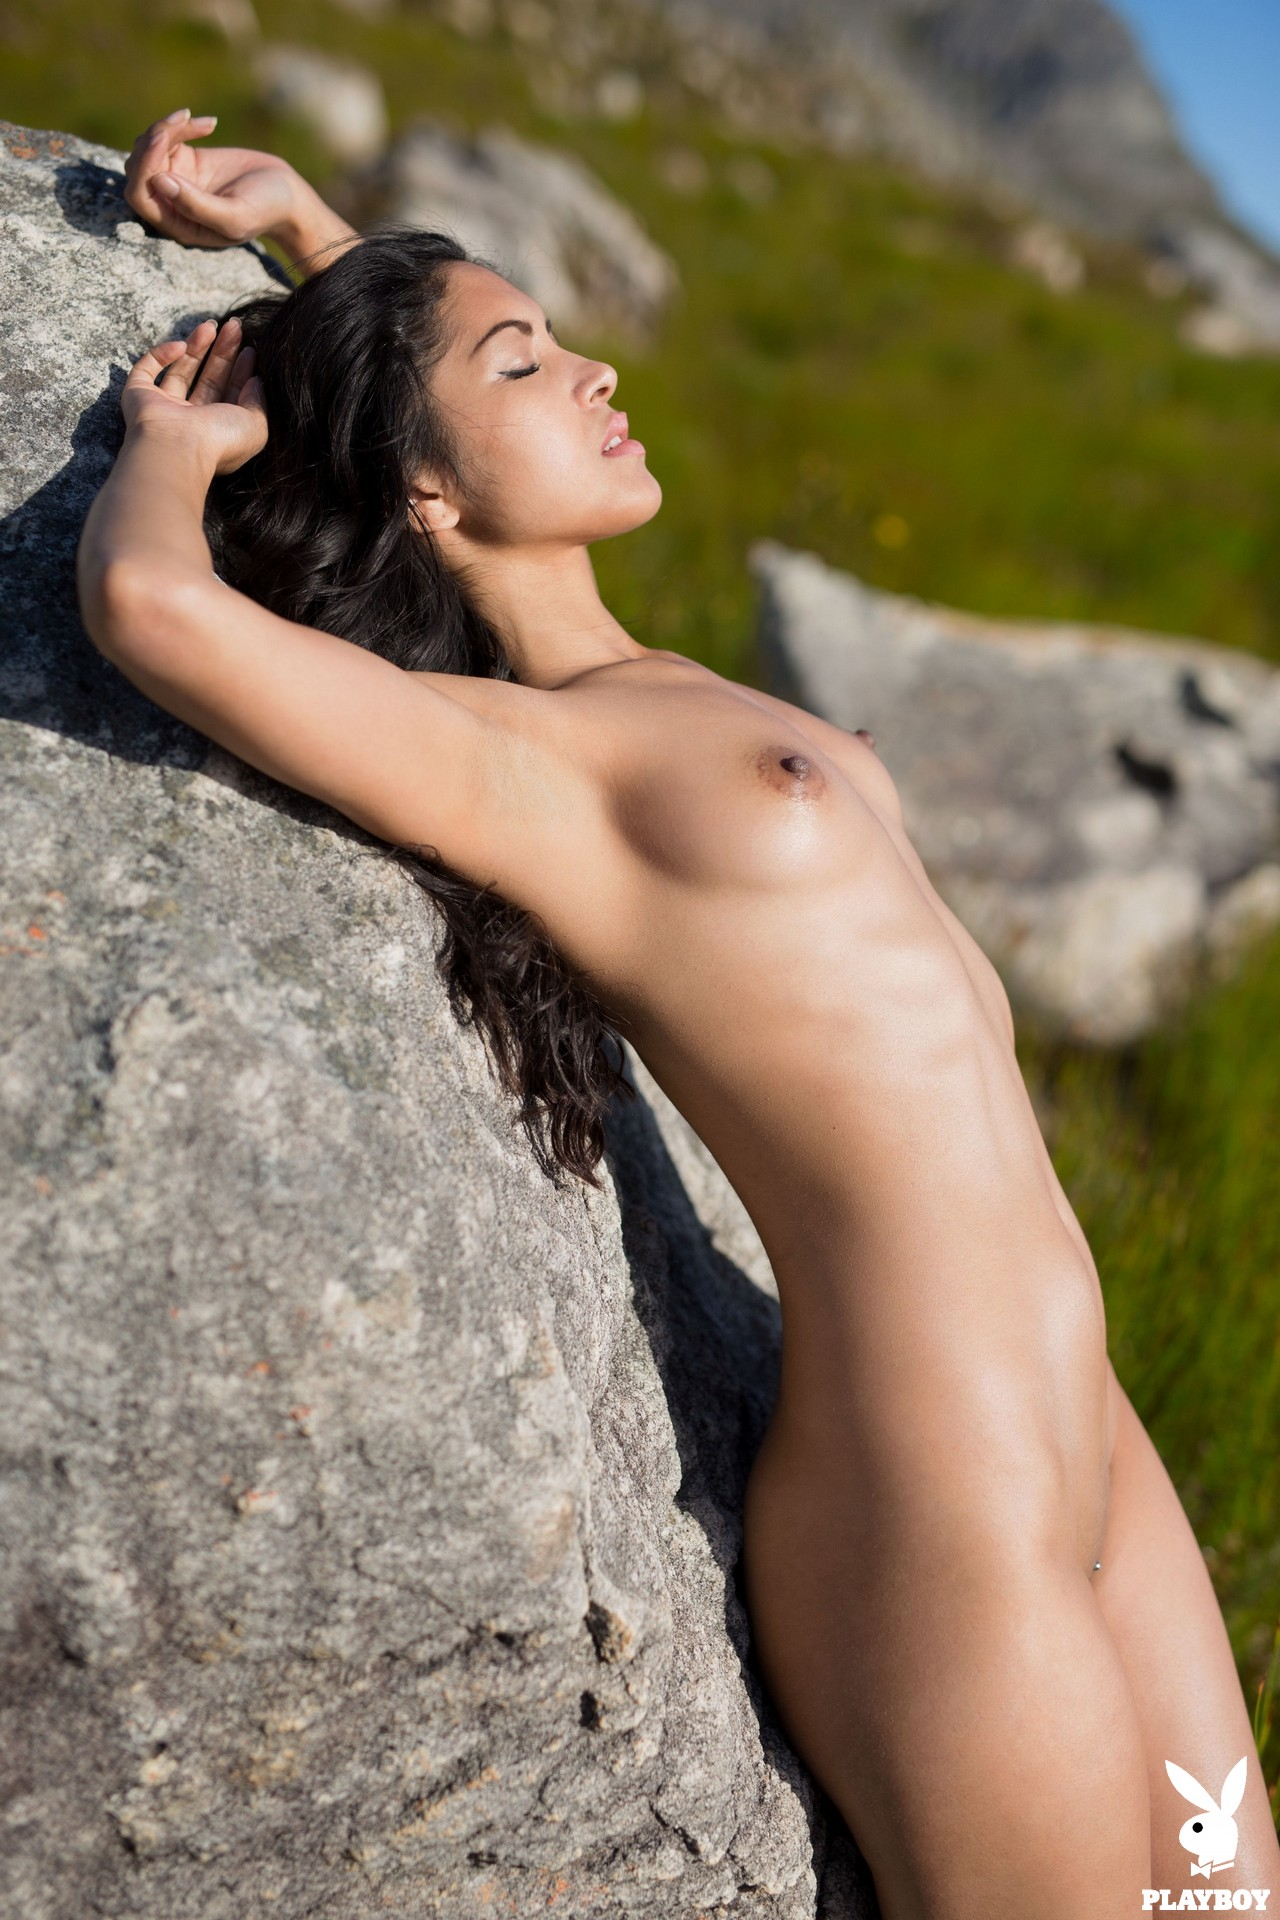 Chloe Rose in Trail Blazing 34